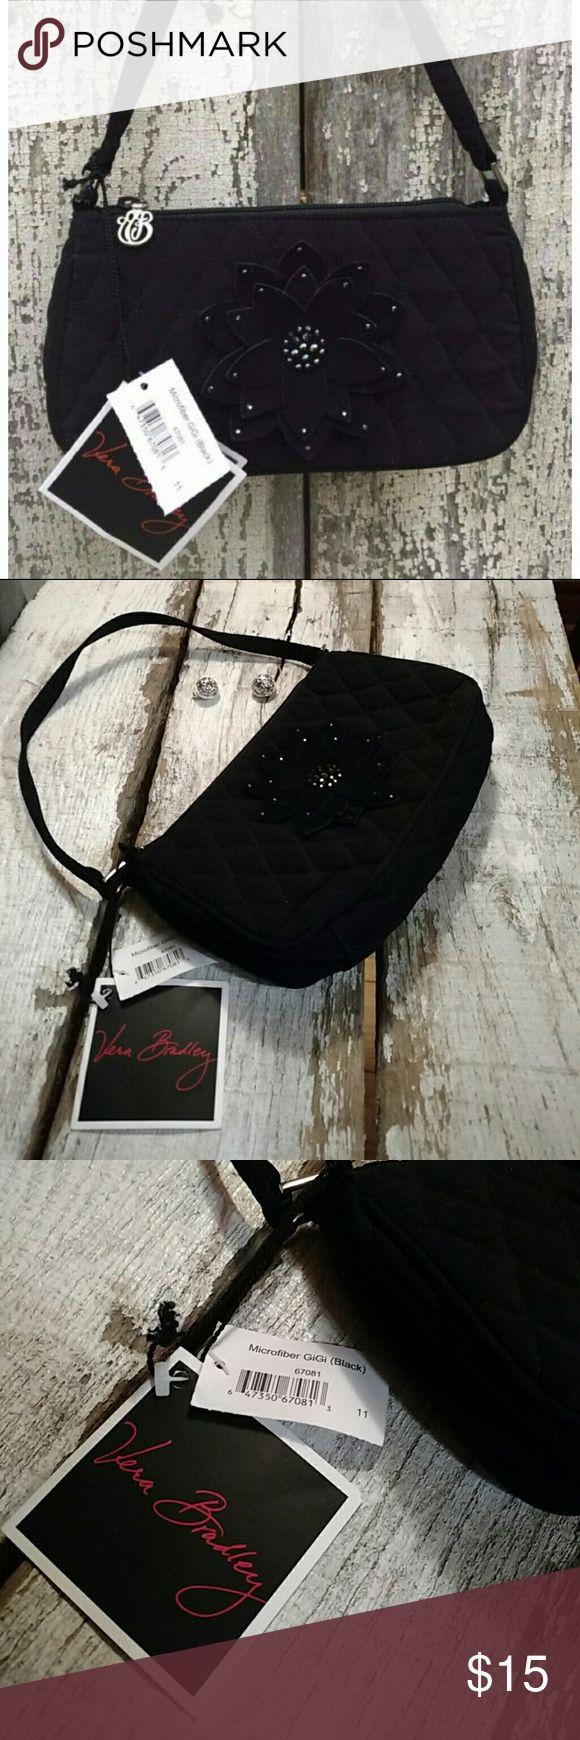 Black GiGi Bag🌼 Black Microfiber GiGi Vera Bradley Bag. The dimensions are 8 3/4 x 4 3/4 x 2 1/4.  Vera Bradley Black Microfiber GiGi handbag. The GiGi evening bag sports a suede posy, accented with jet black crystal beading, so cute. It has silver VB zipper pull and accents, plus a slim little strap. Vera Bradley Bags Mini Bags